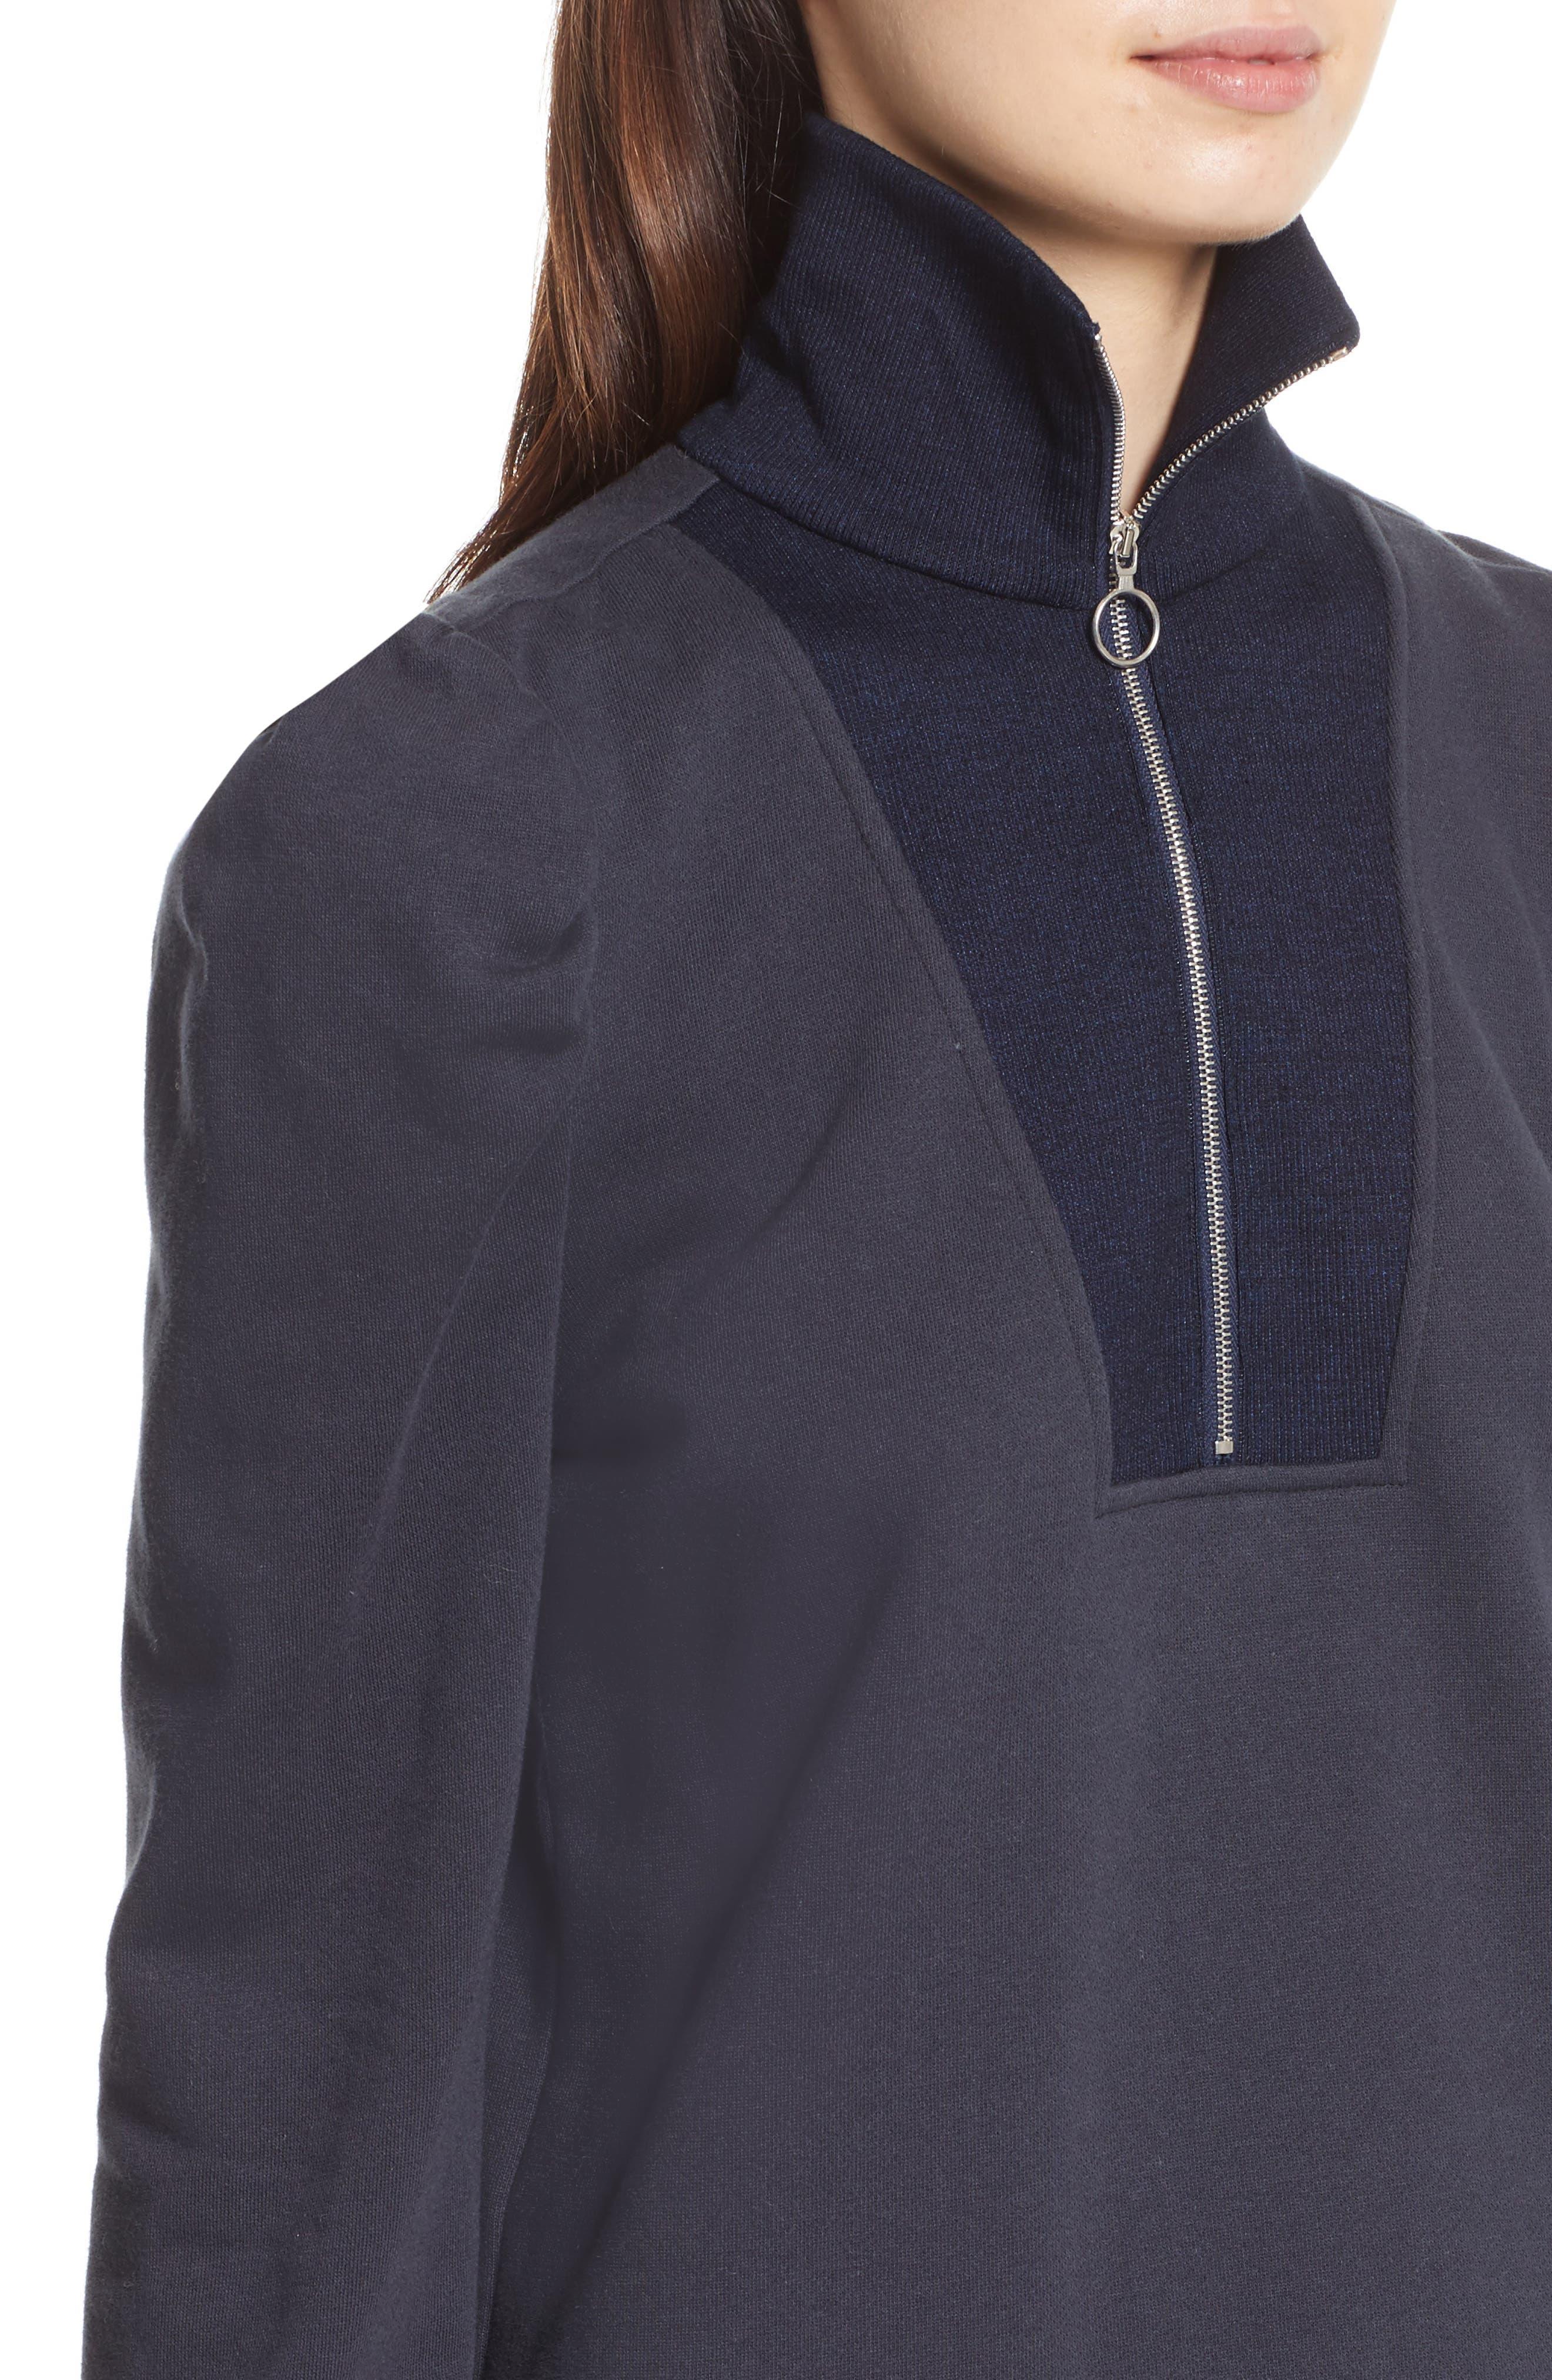 Turtleneck Fleece Zip Pullover,                             Alternate thumbnail 4, color,                             403